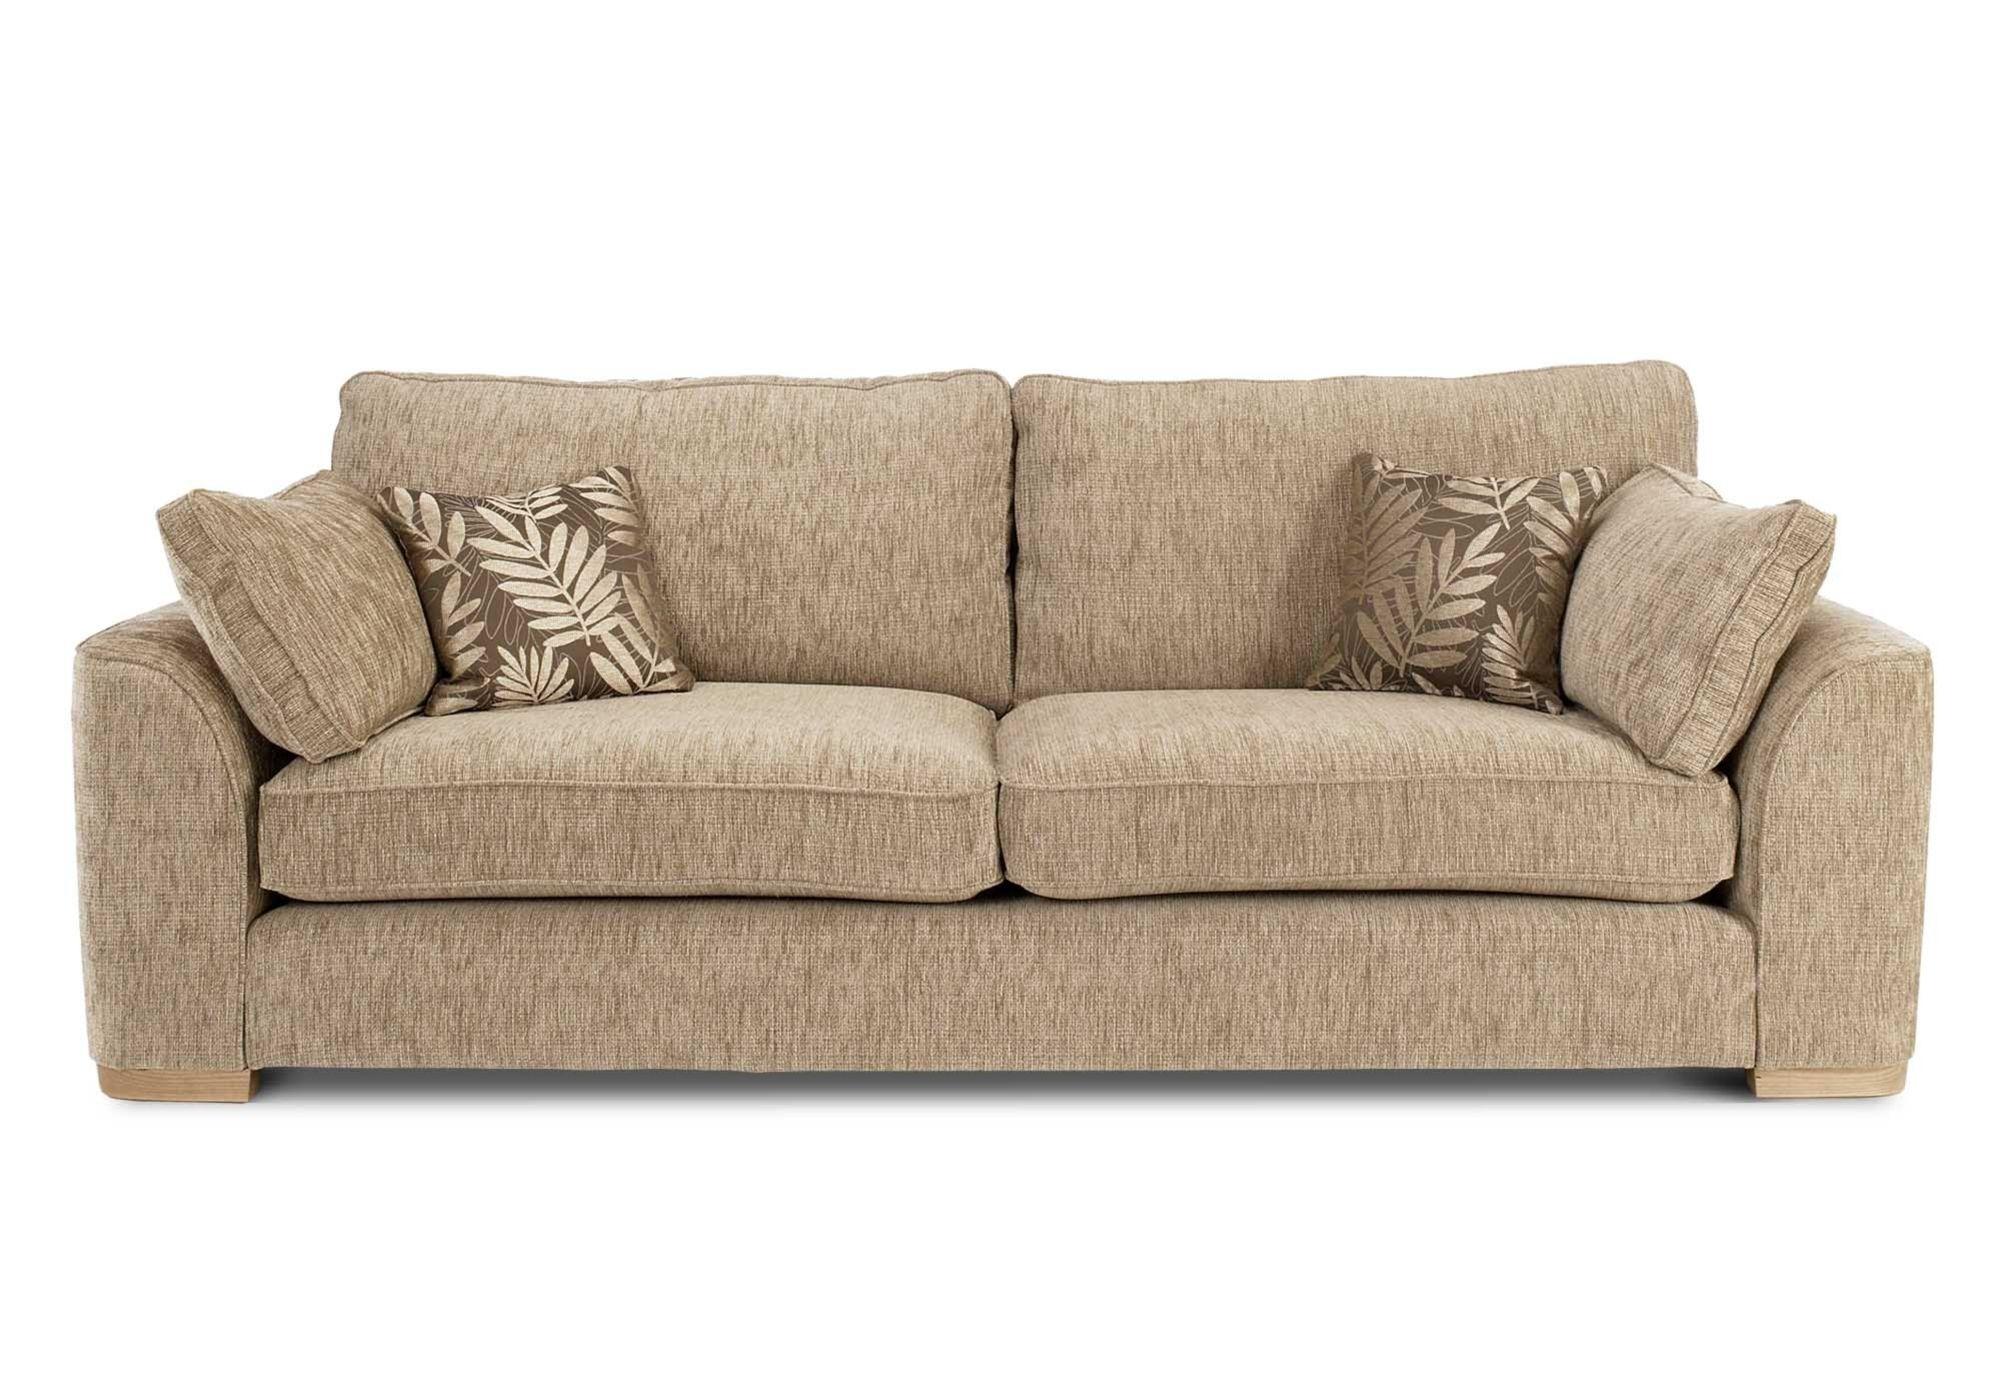 4 Seater Clic Back Sofa Lonsdale Sets Corner Sofas Leather Furniture Village